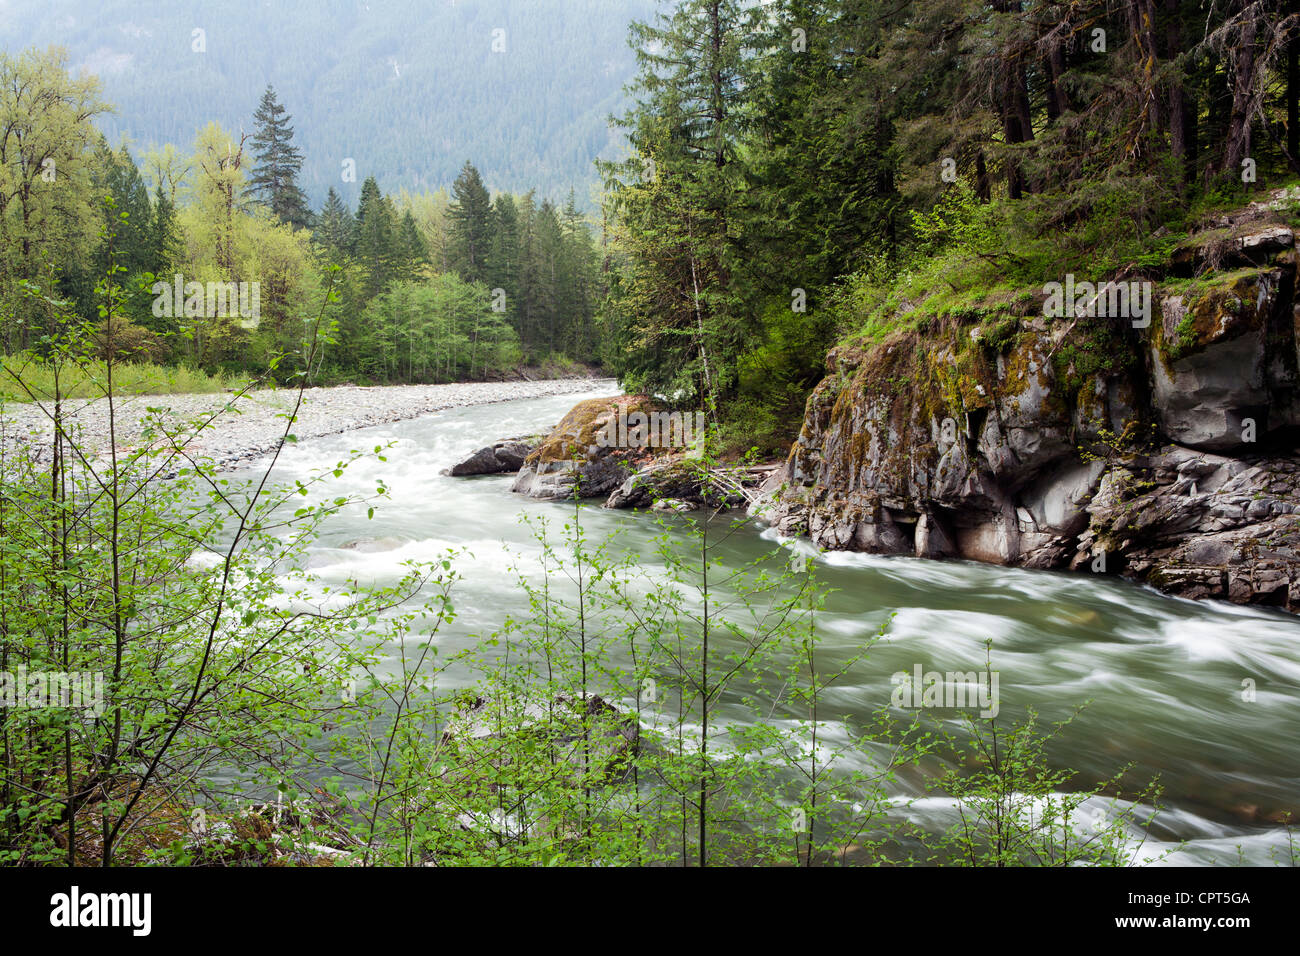 Coquihalla río cerca de Othello túneles - Coquihalla Canyon Parque Provincial - esperanza, British Columbia, Canadá Foto de stock